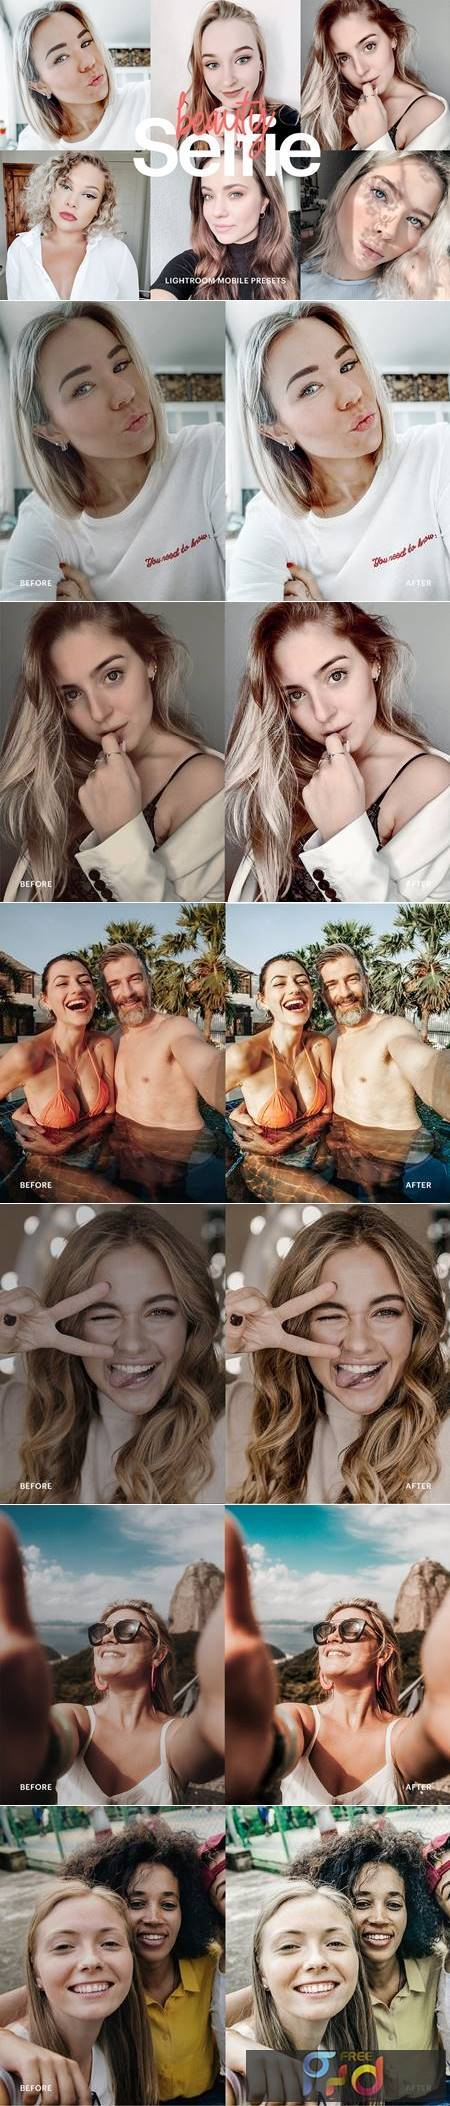 Lightroom Preset - Selfie Beauty Theme 4976167 1